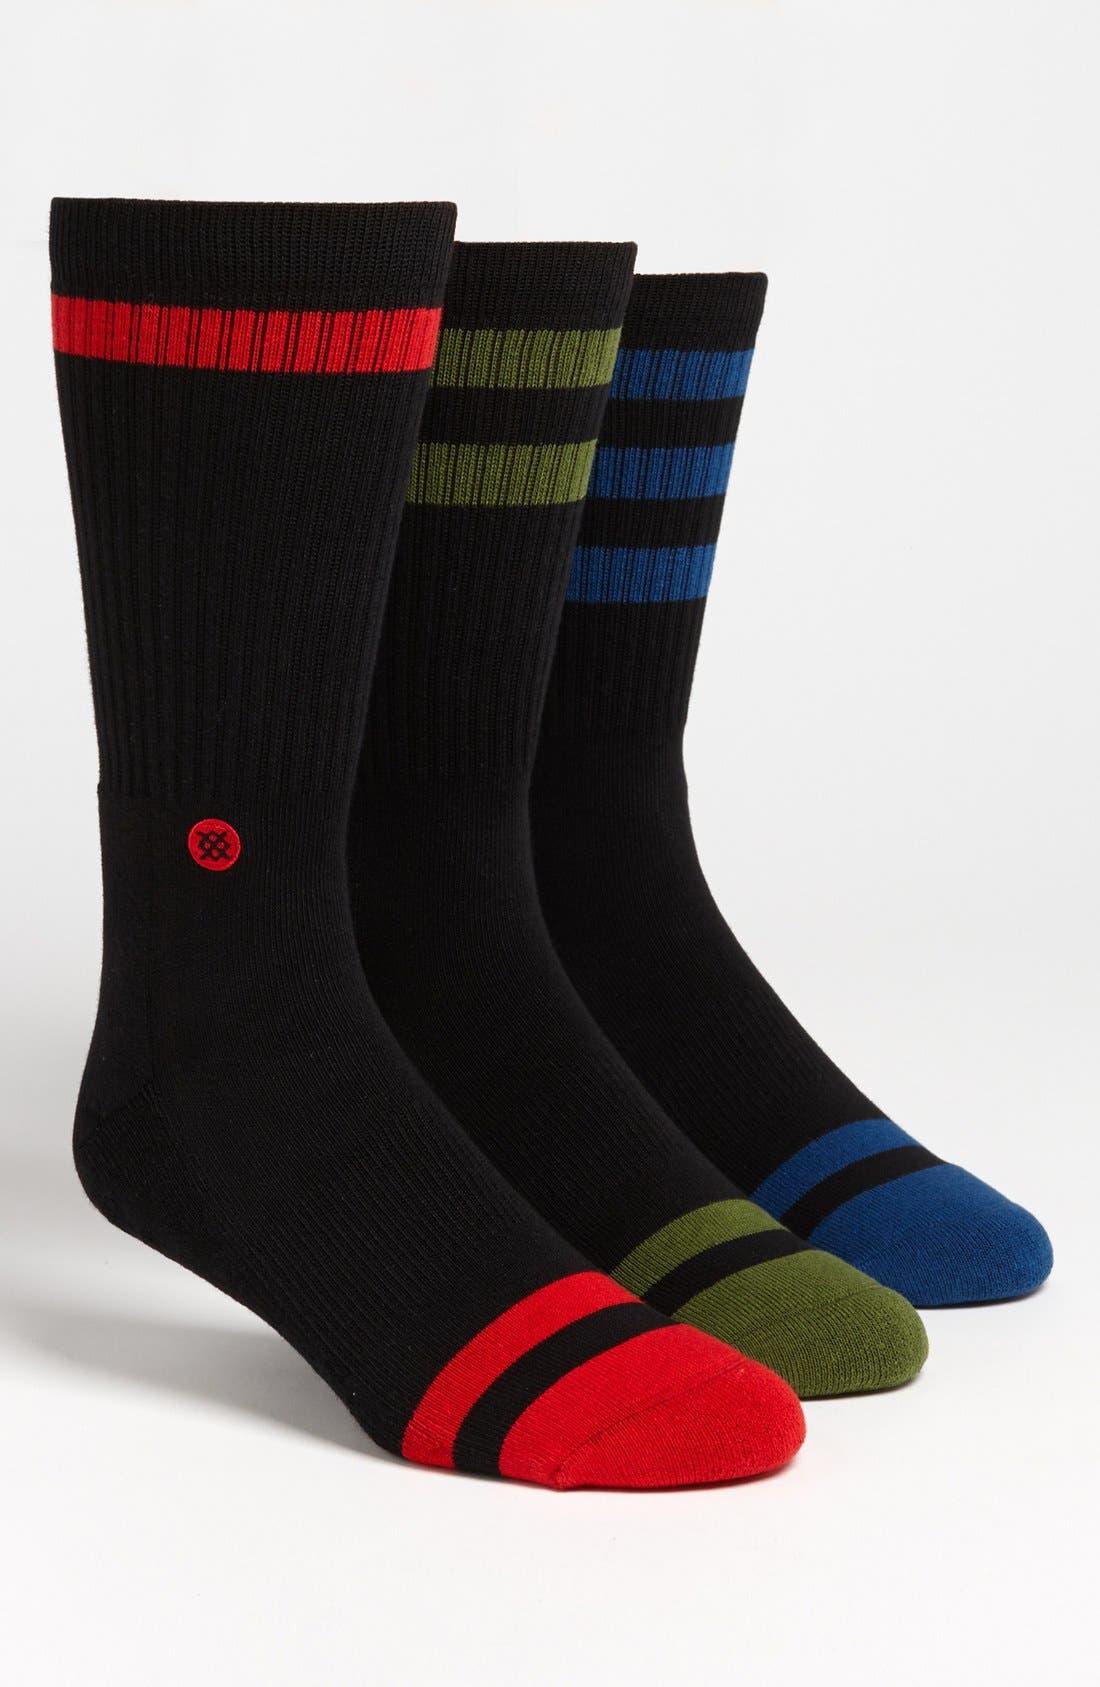 Main Image - Stance 'Triple Threat' Crew Socks (Set of 3)